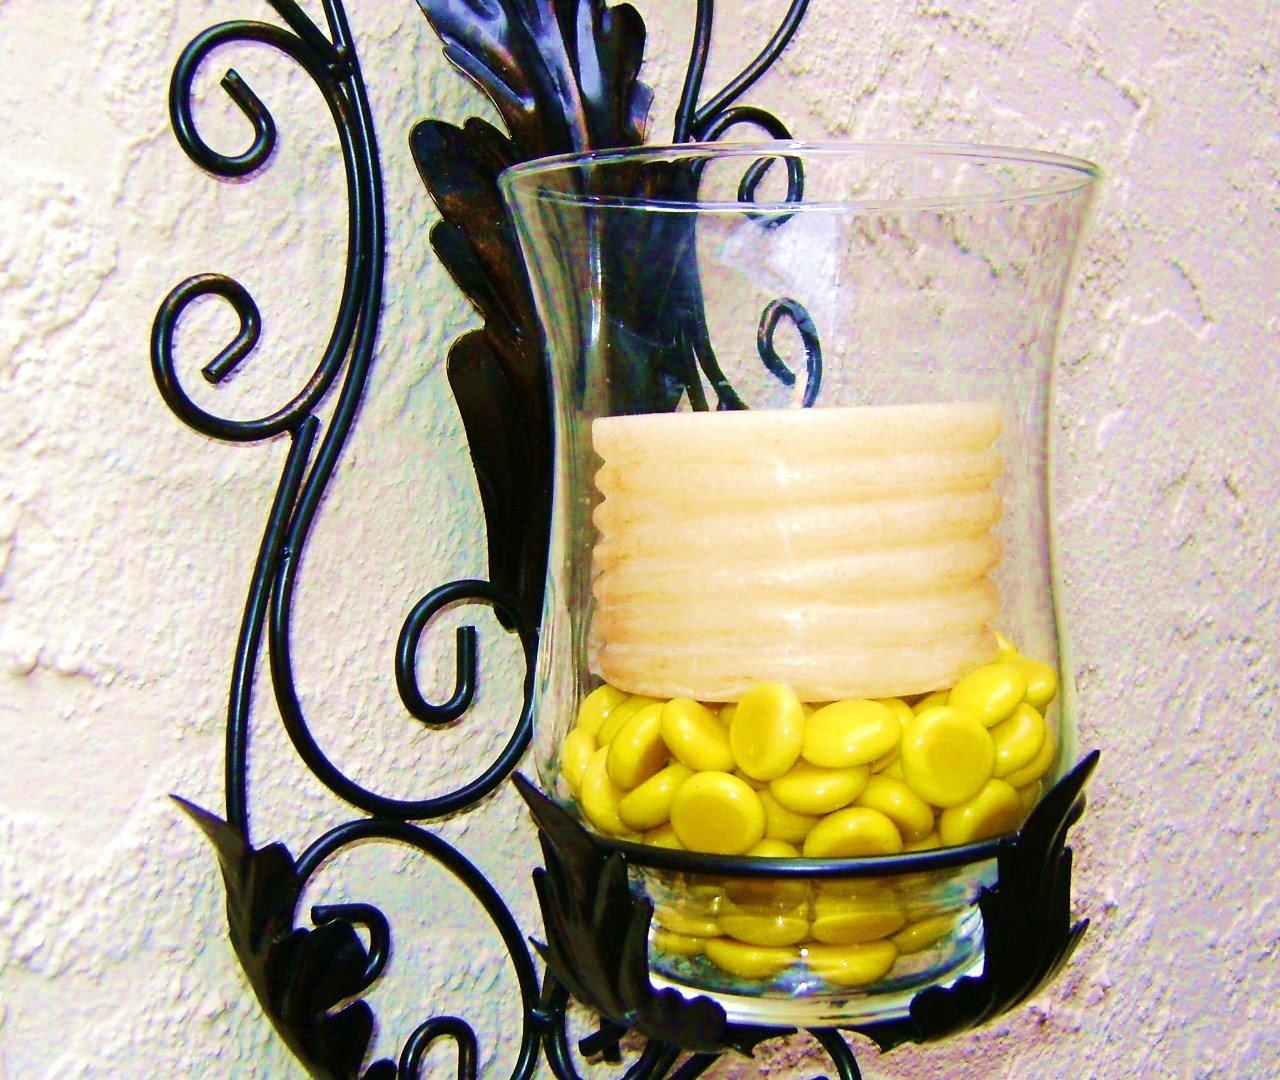 Glass Gems Vase Fillers Creative Stuff Glass 1 LB Amber